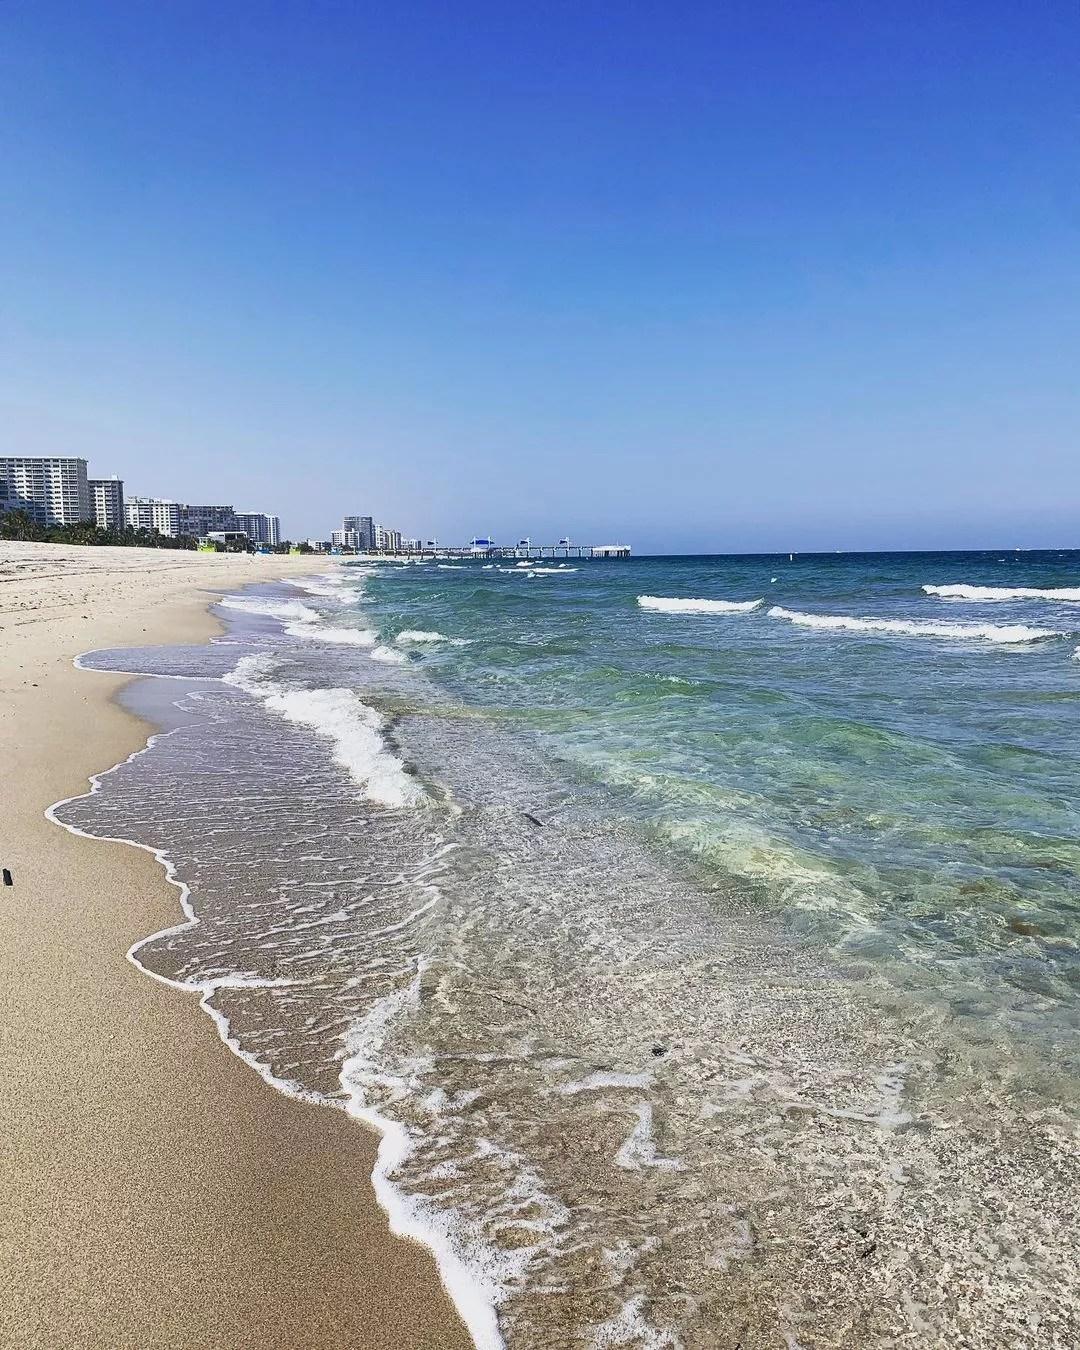 Beach Front View in Pompano Beach, FL. Photo by Instagram user @pompanobeachreport